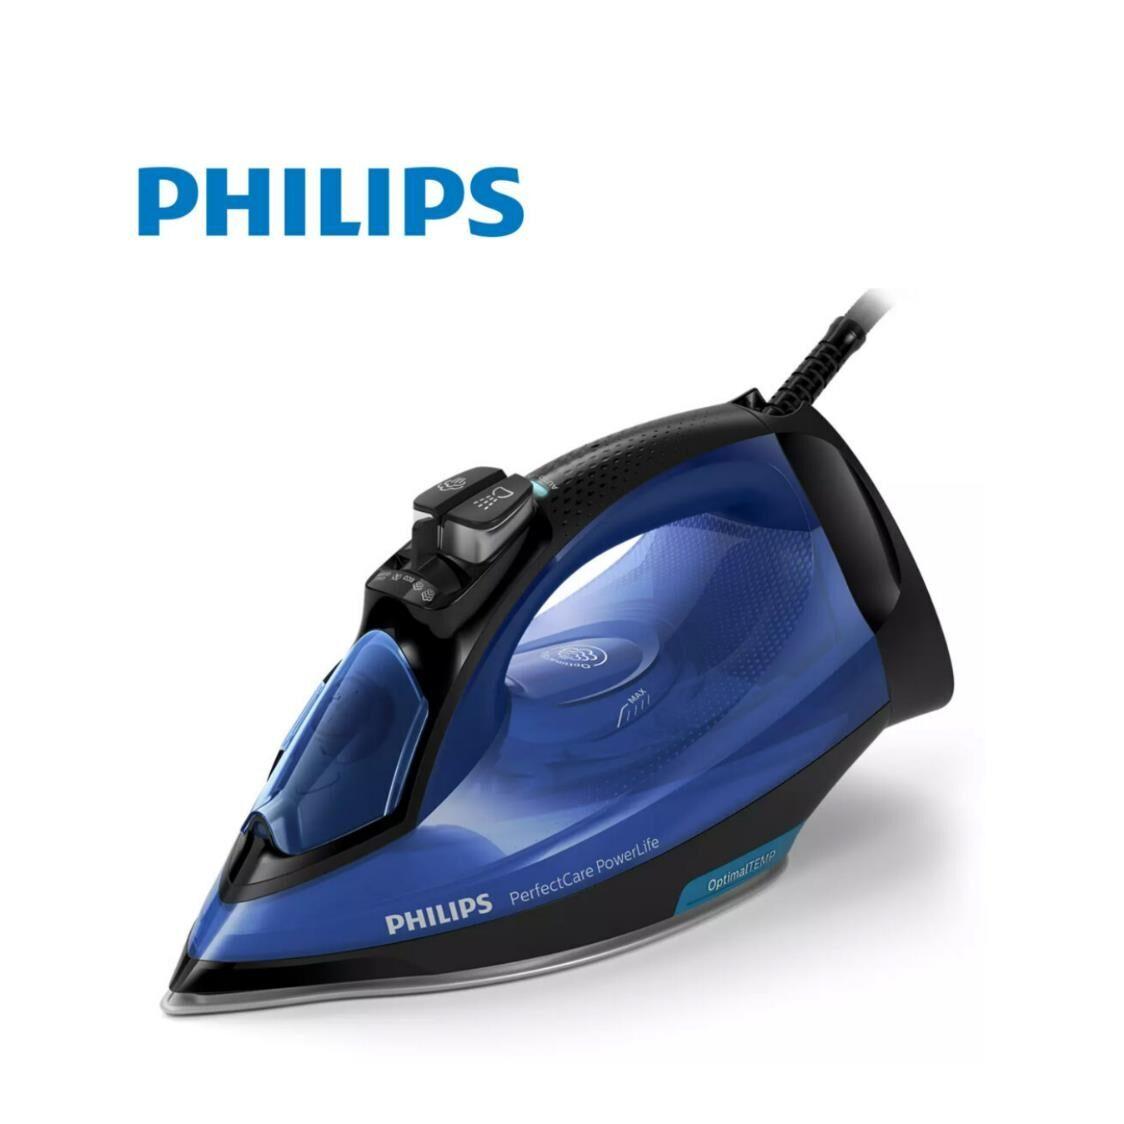 Philips 2500w Optimal Steam Iron